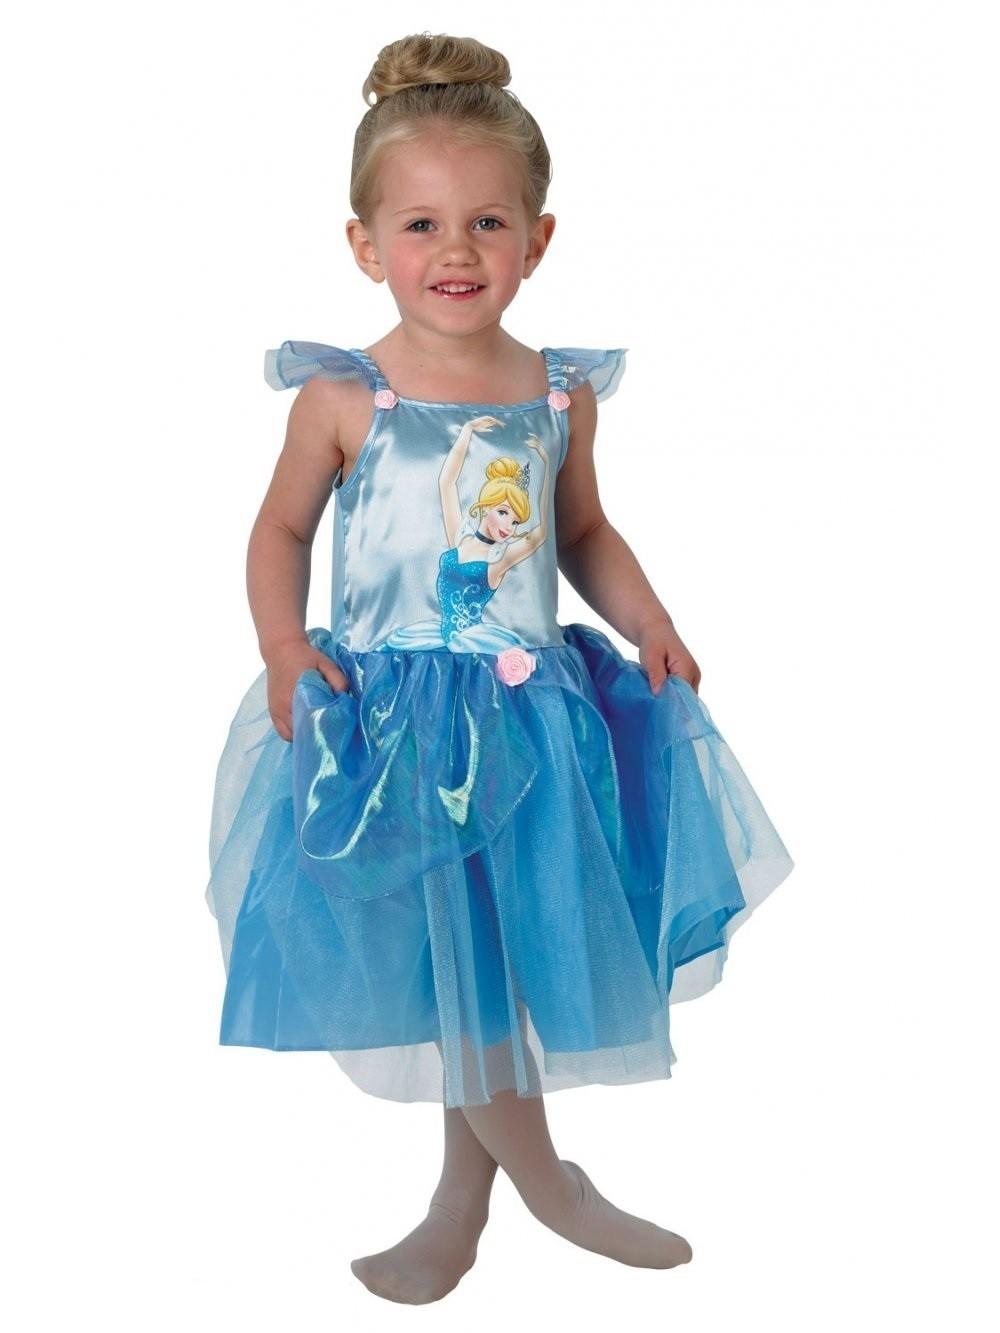 Костюм Золушки балерины (26-28) детский костюм золушки deluxe 26 28